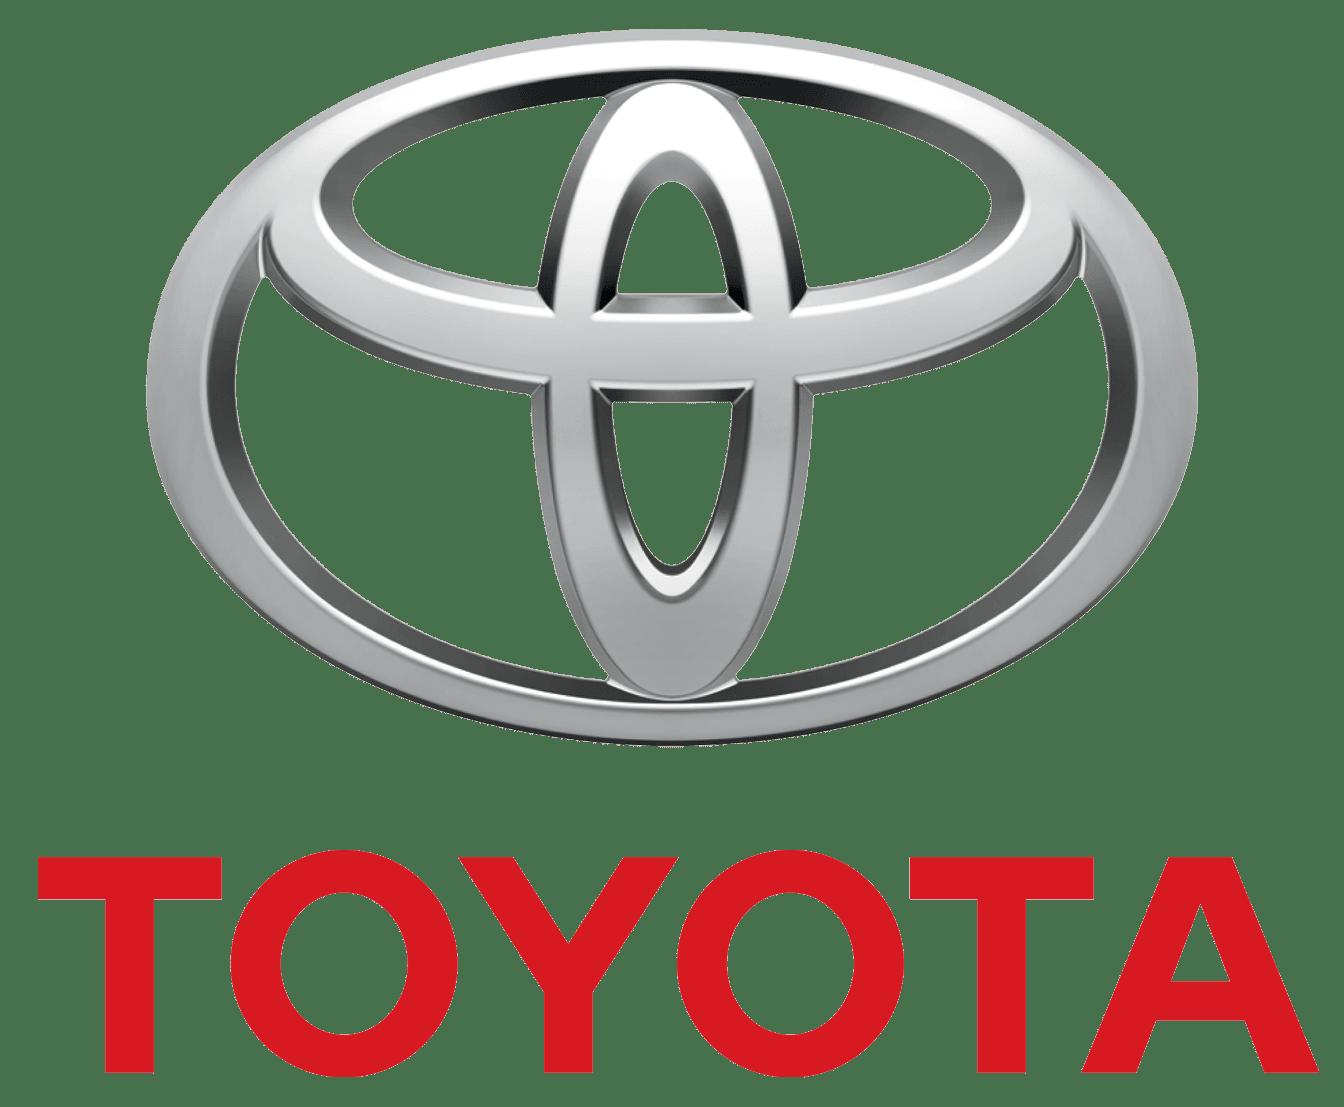 Toyota-logo-1989-2560x1440